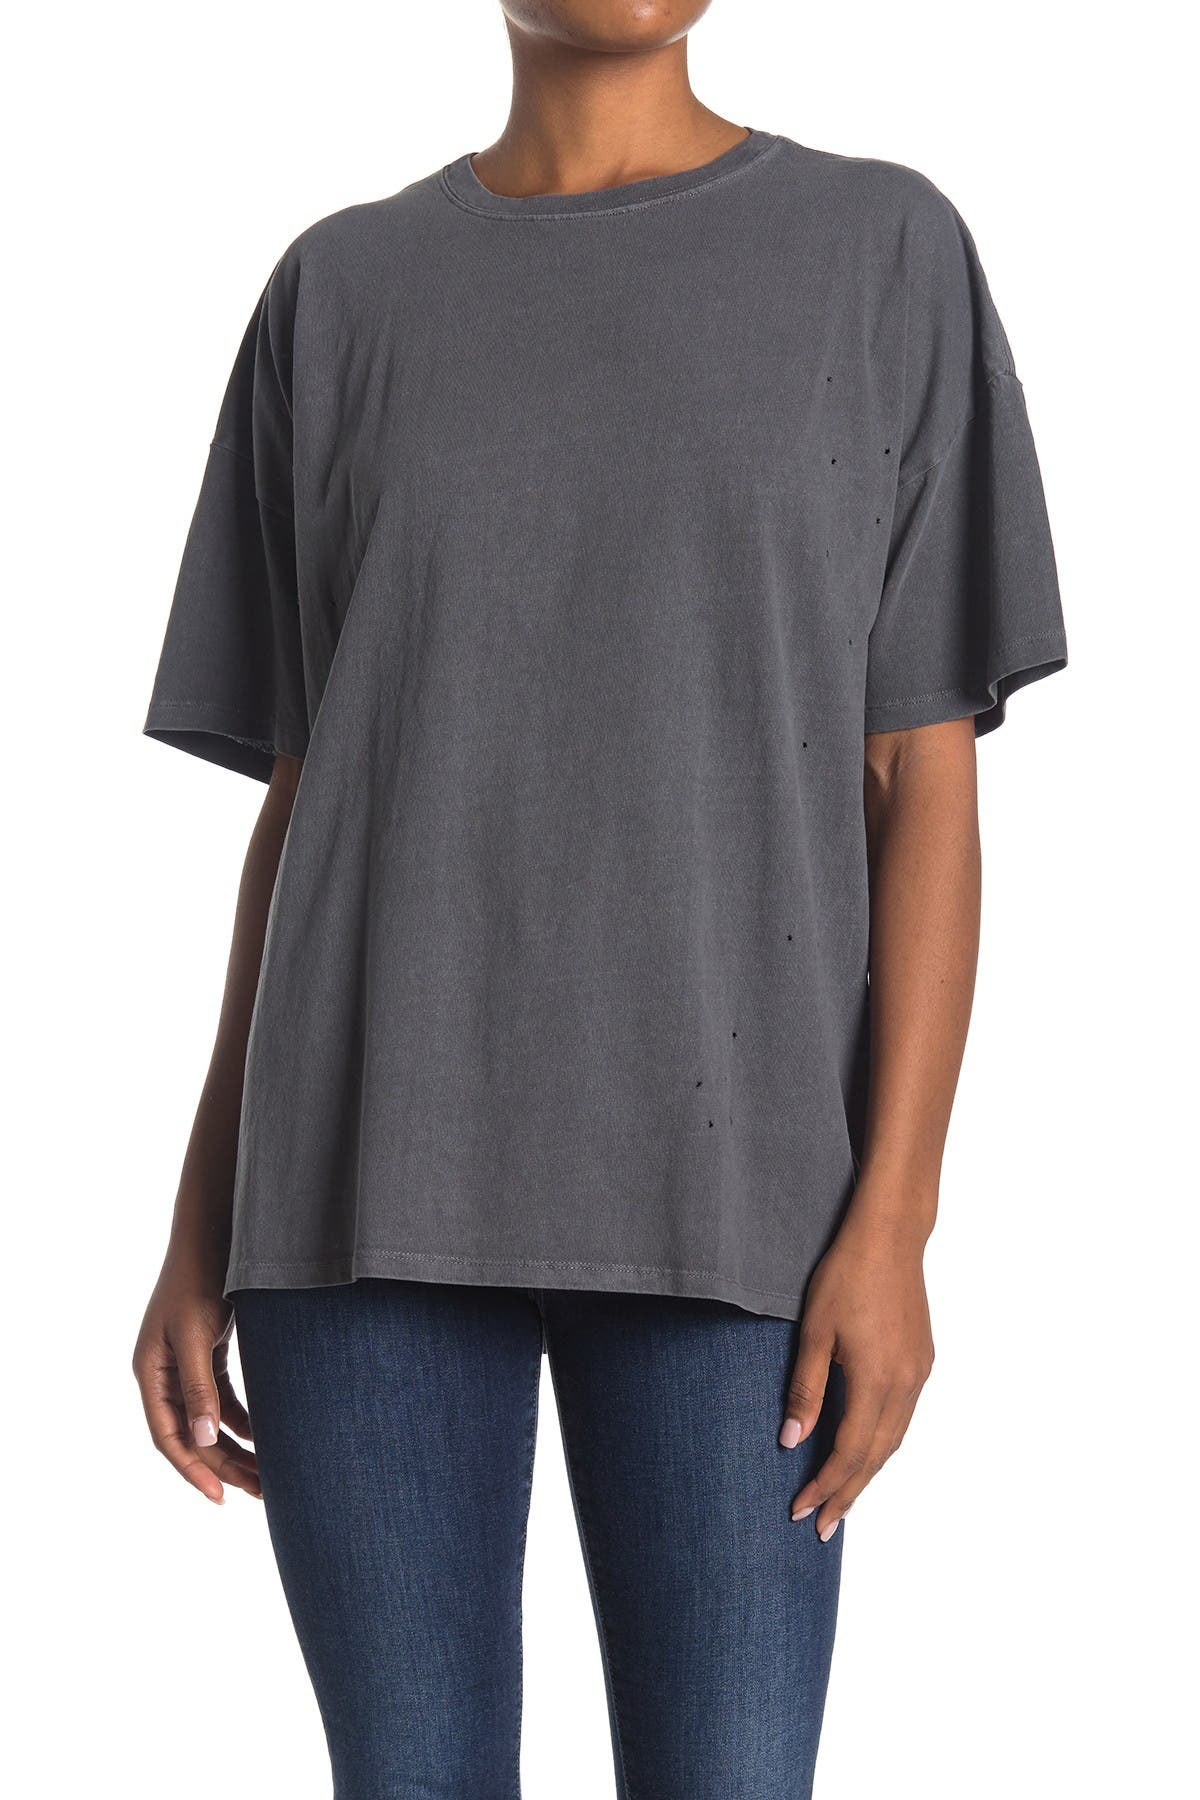 Image of Double Zero Distressed Oversized T-Shirt